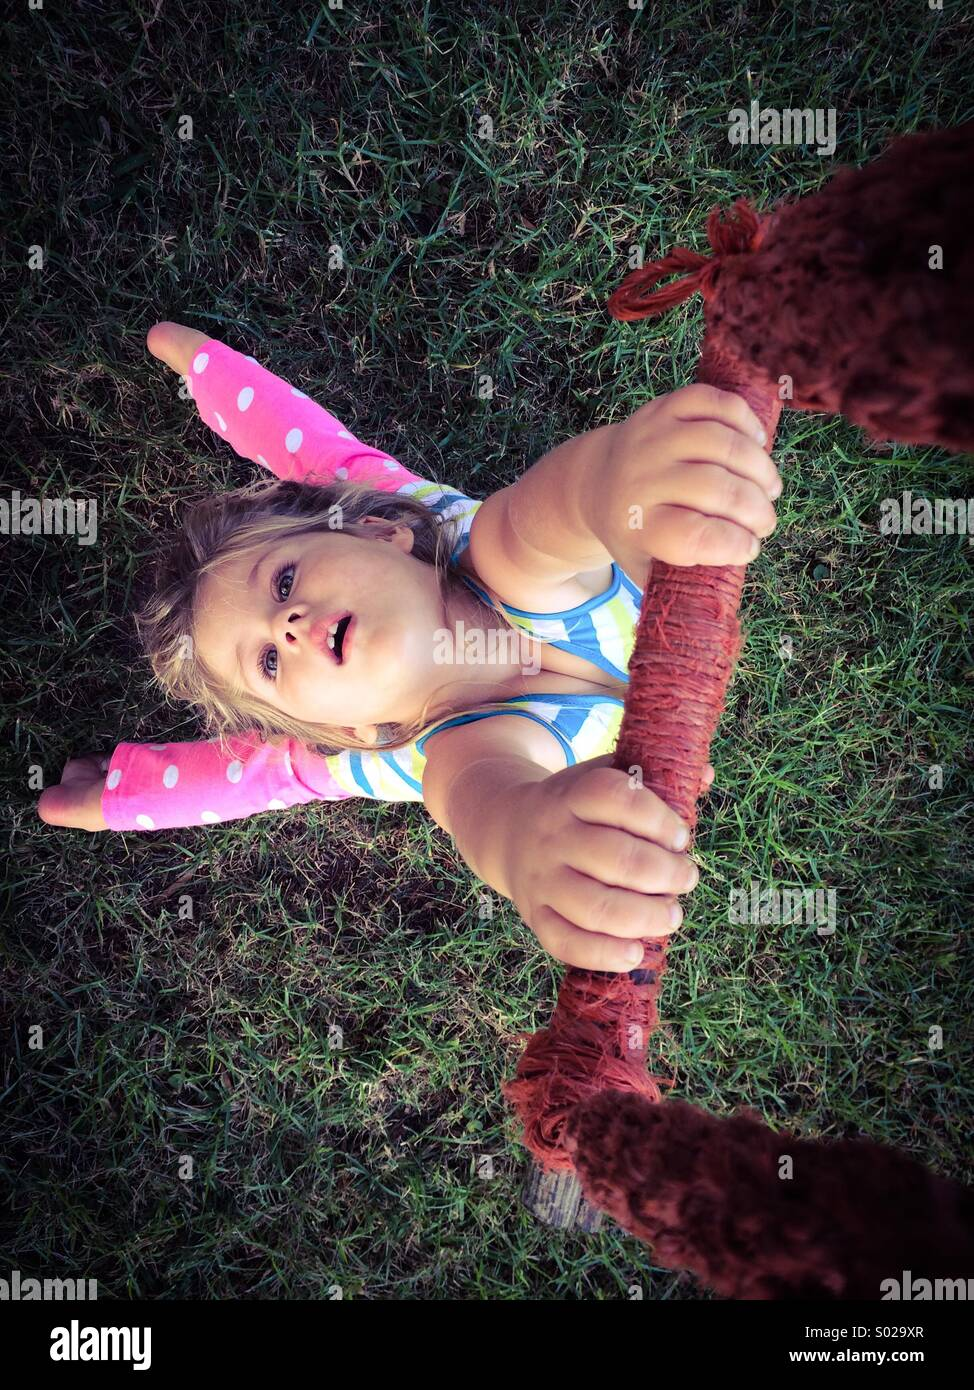 Chica sujetando un columpio. Imagen De Stock